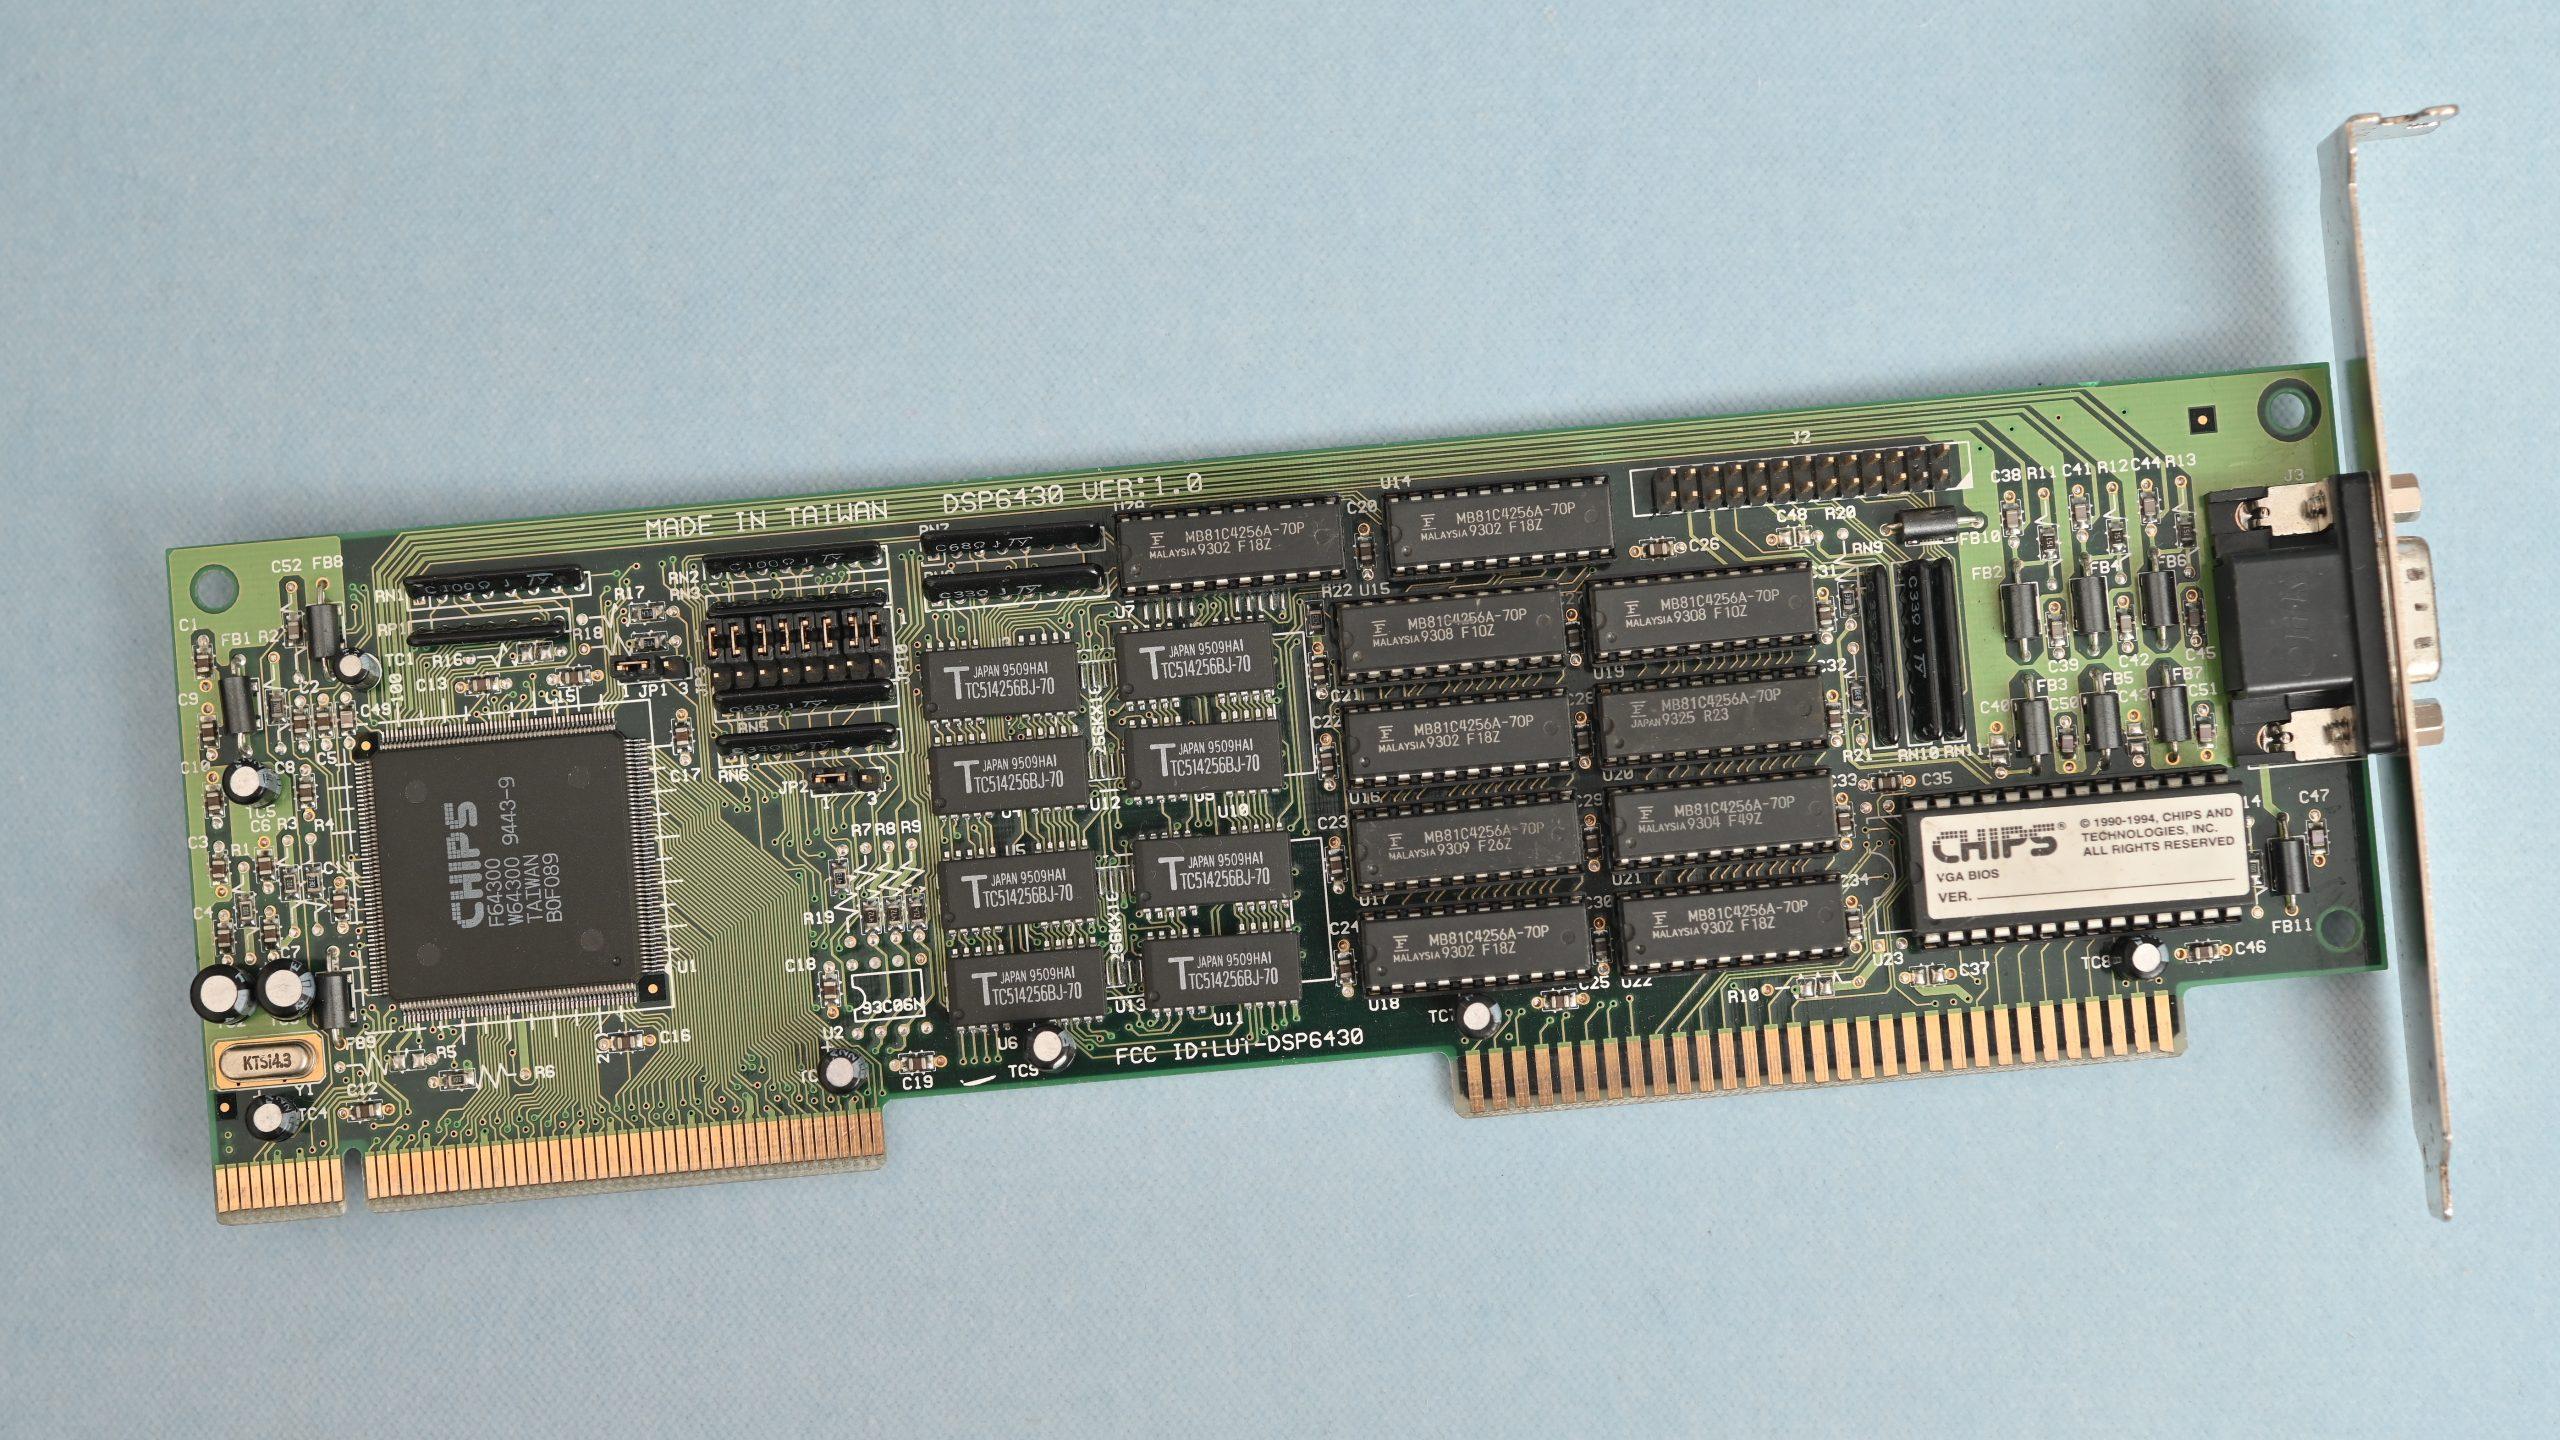 DSC_8501-1-scaled.jpeg